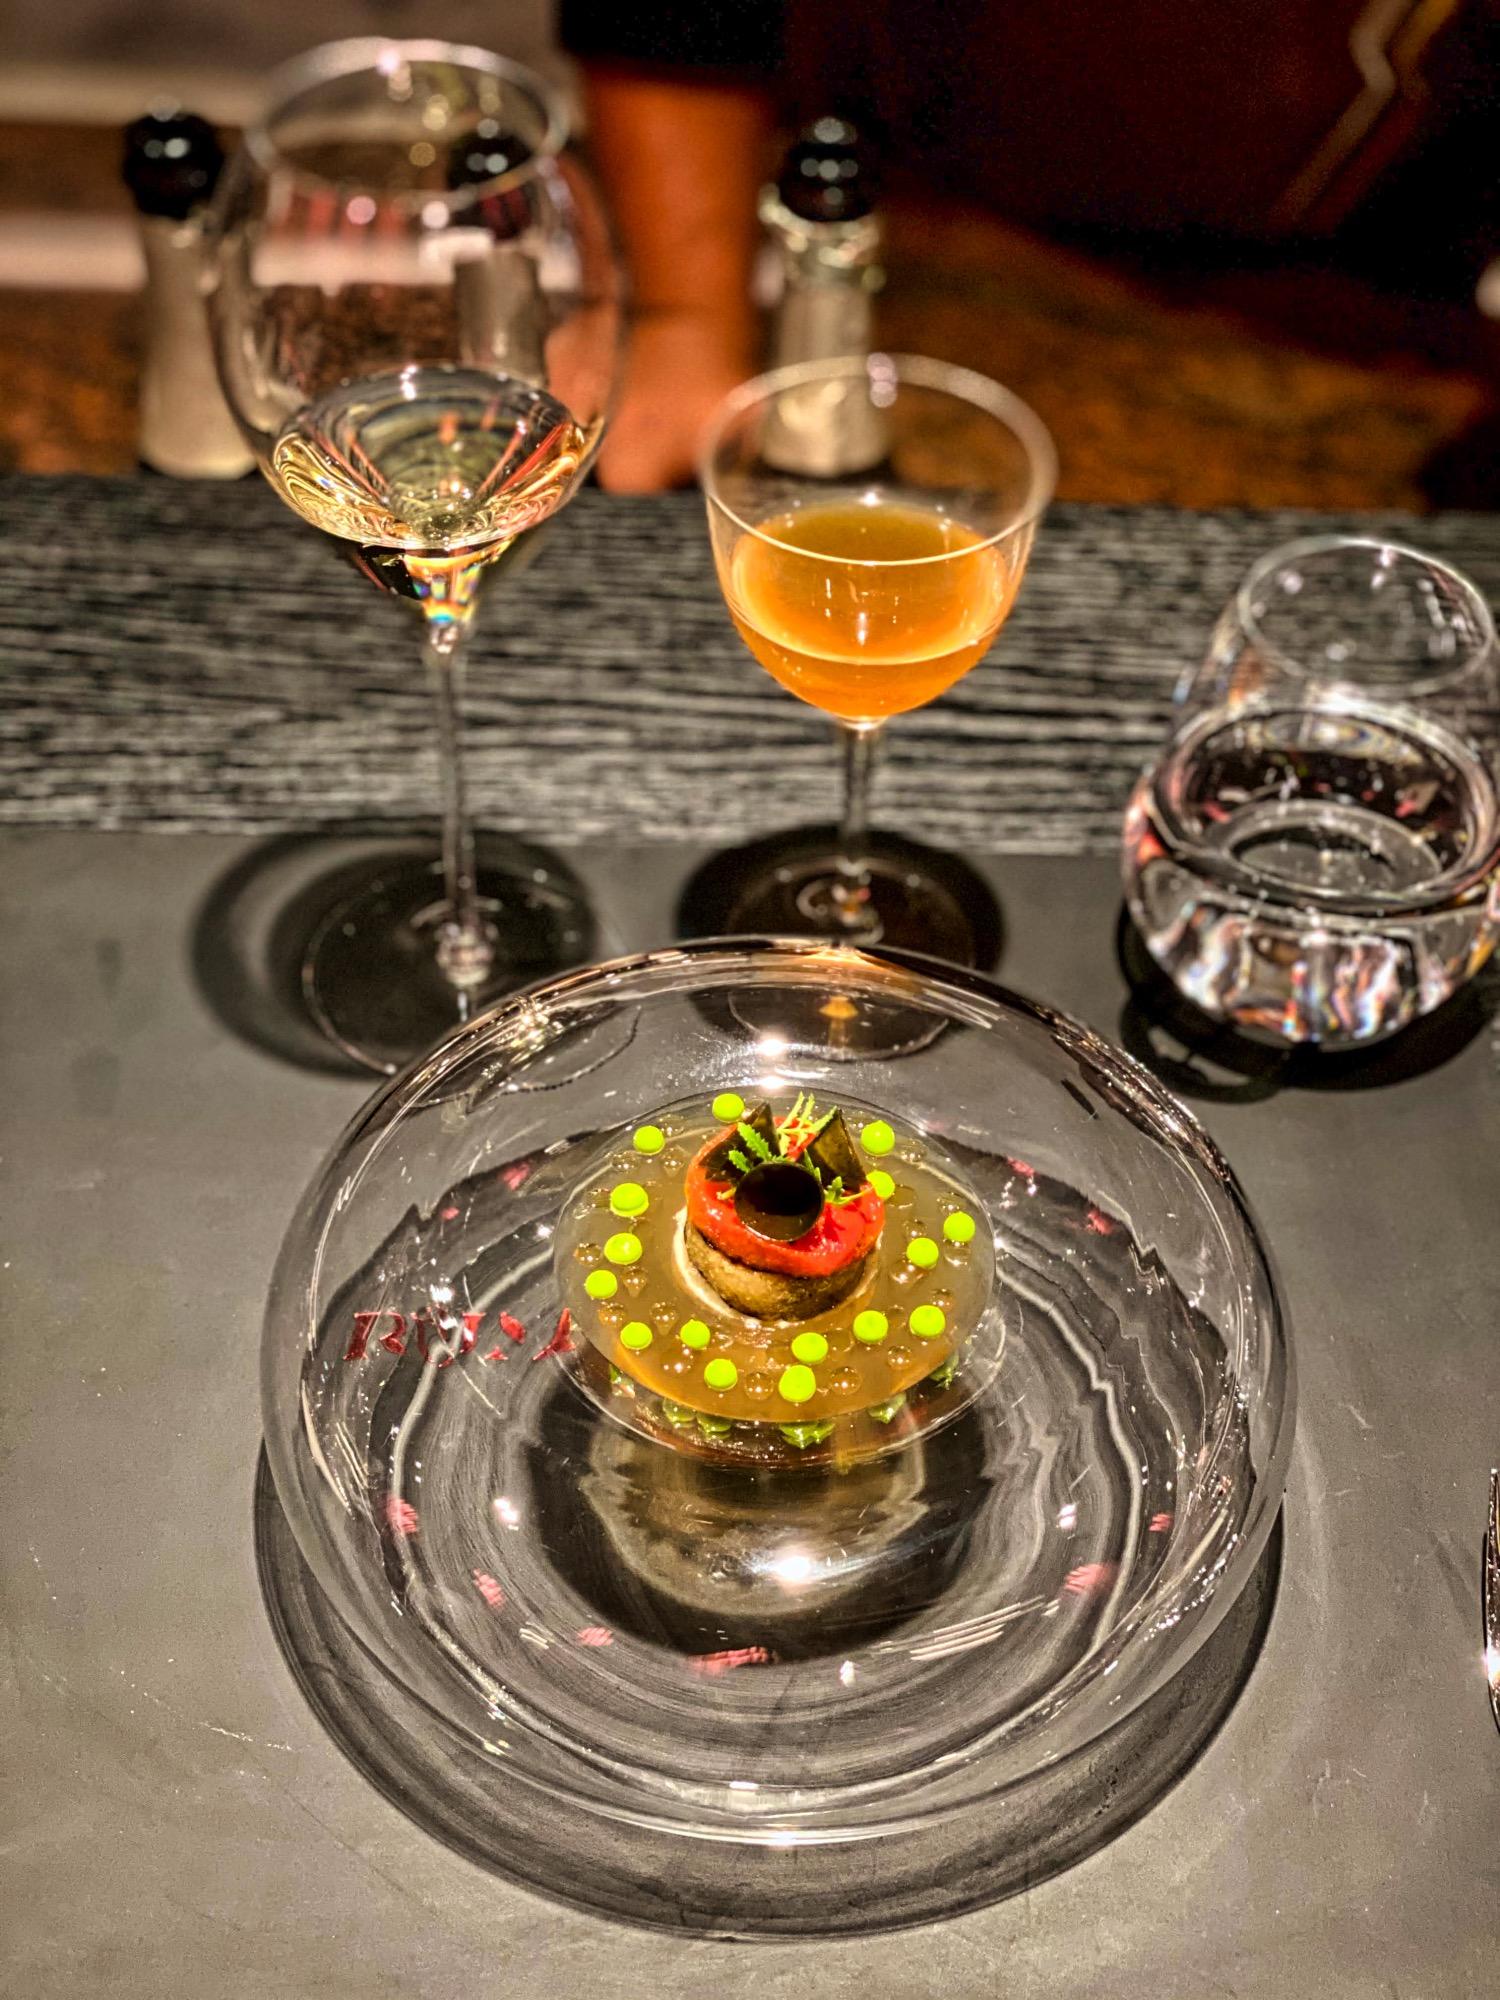 img_8501_rumour_racz_jeno_budapest_restaurant_jokuti_vilagevo_l_f.jpeg